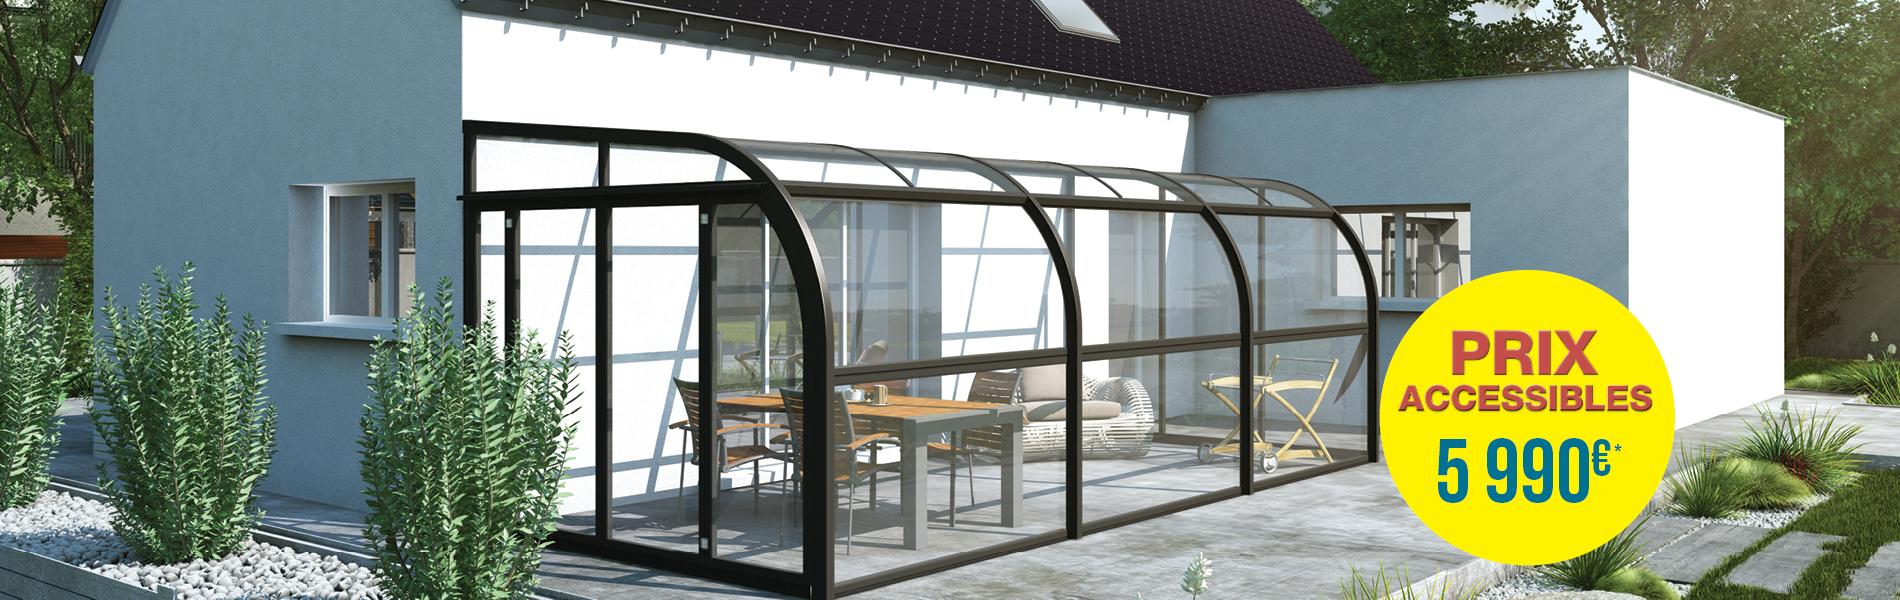 veranda rideau prix au m2 veranda. Black Bedroom Furniture Sets. Home Design Ideas